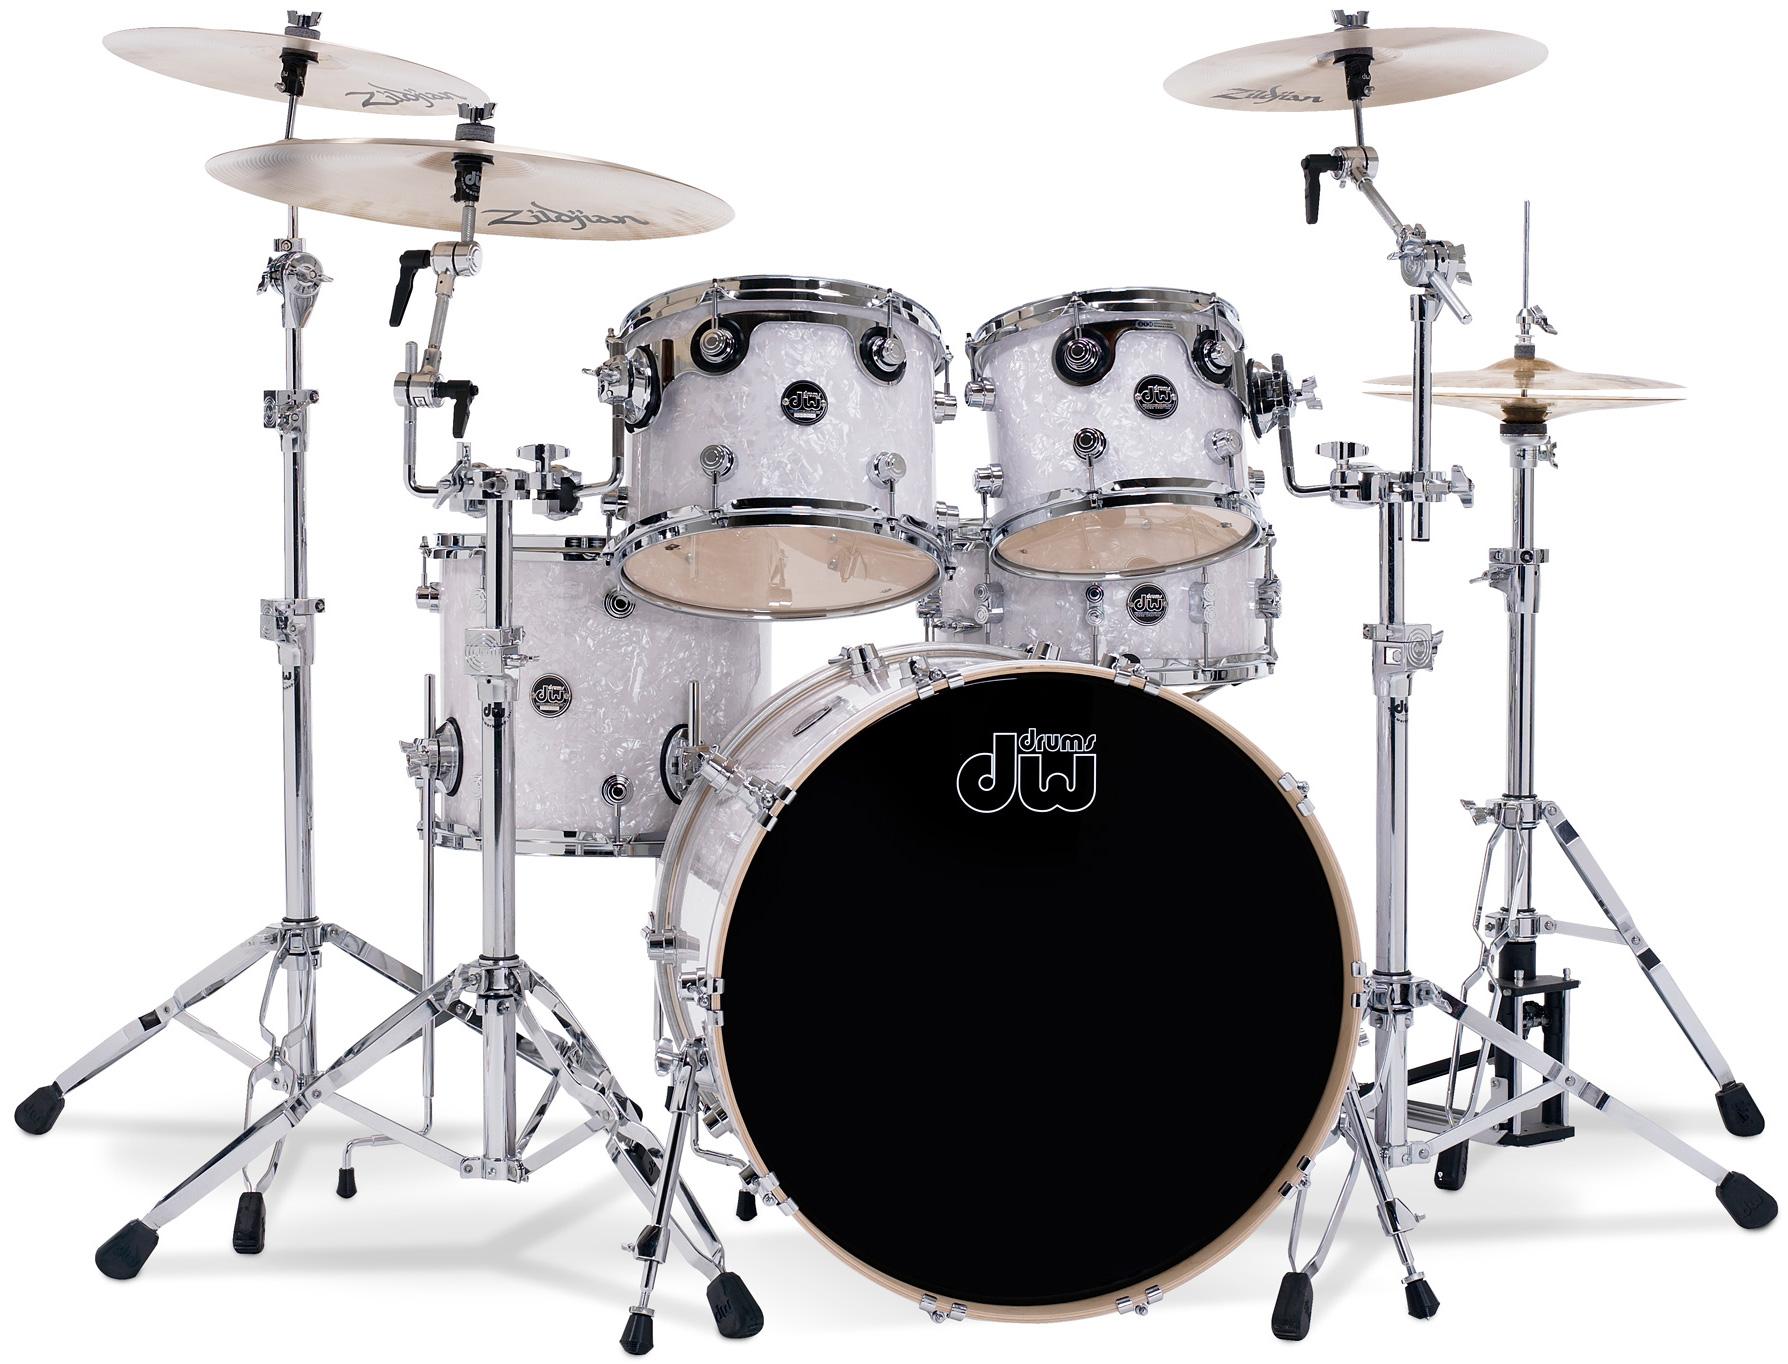 bon produit avis dw drums performance series 5 f ts white marine audiofanzine. Black Bedroom Furniture Sets. Home Design Ideas